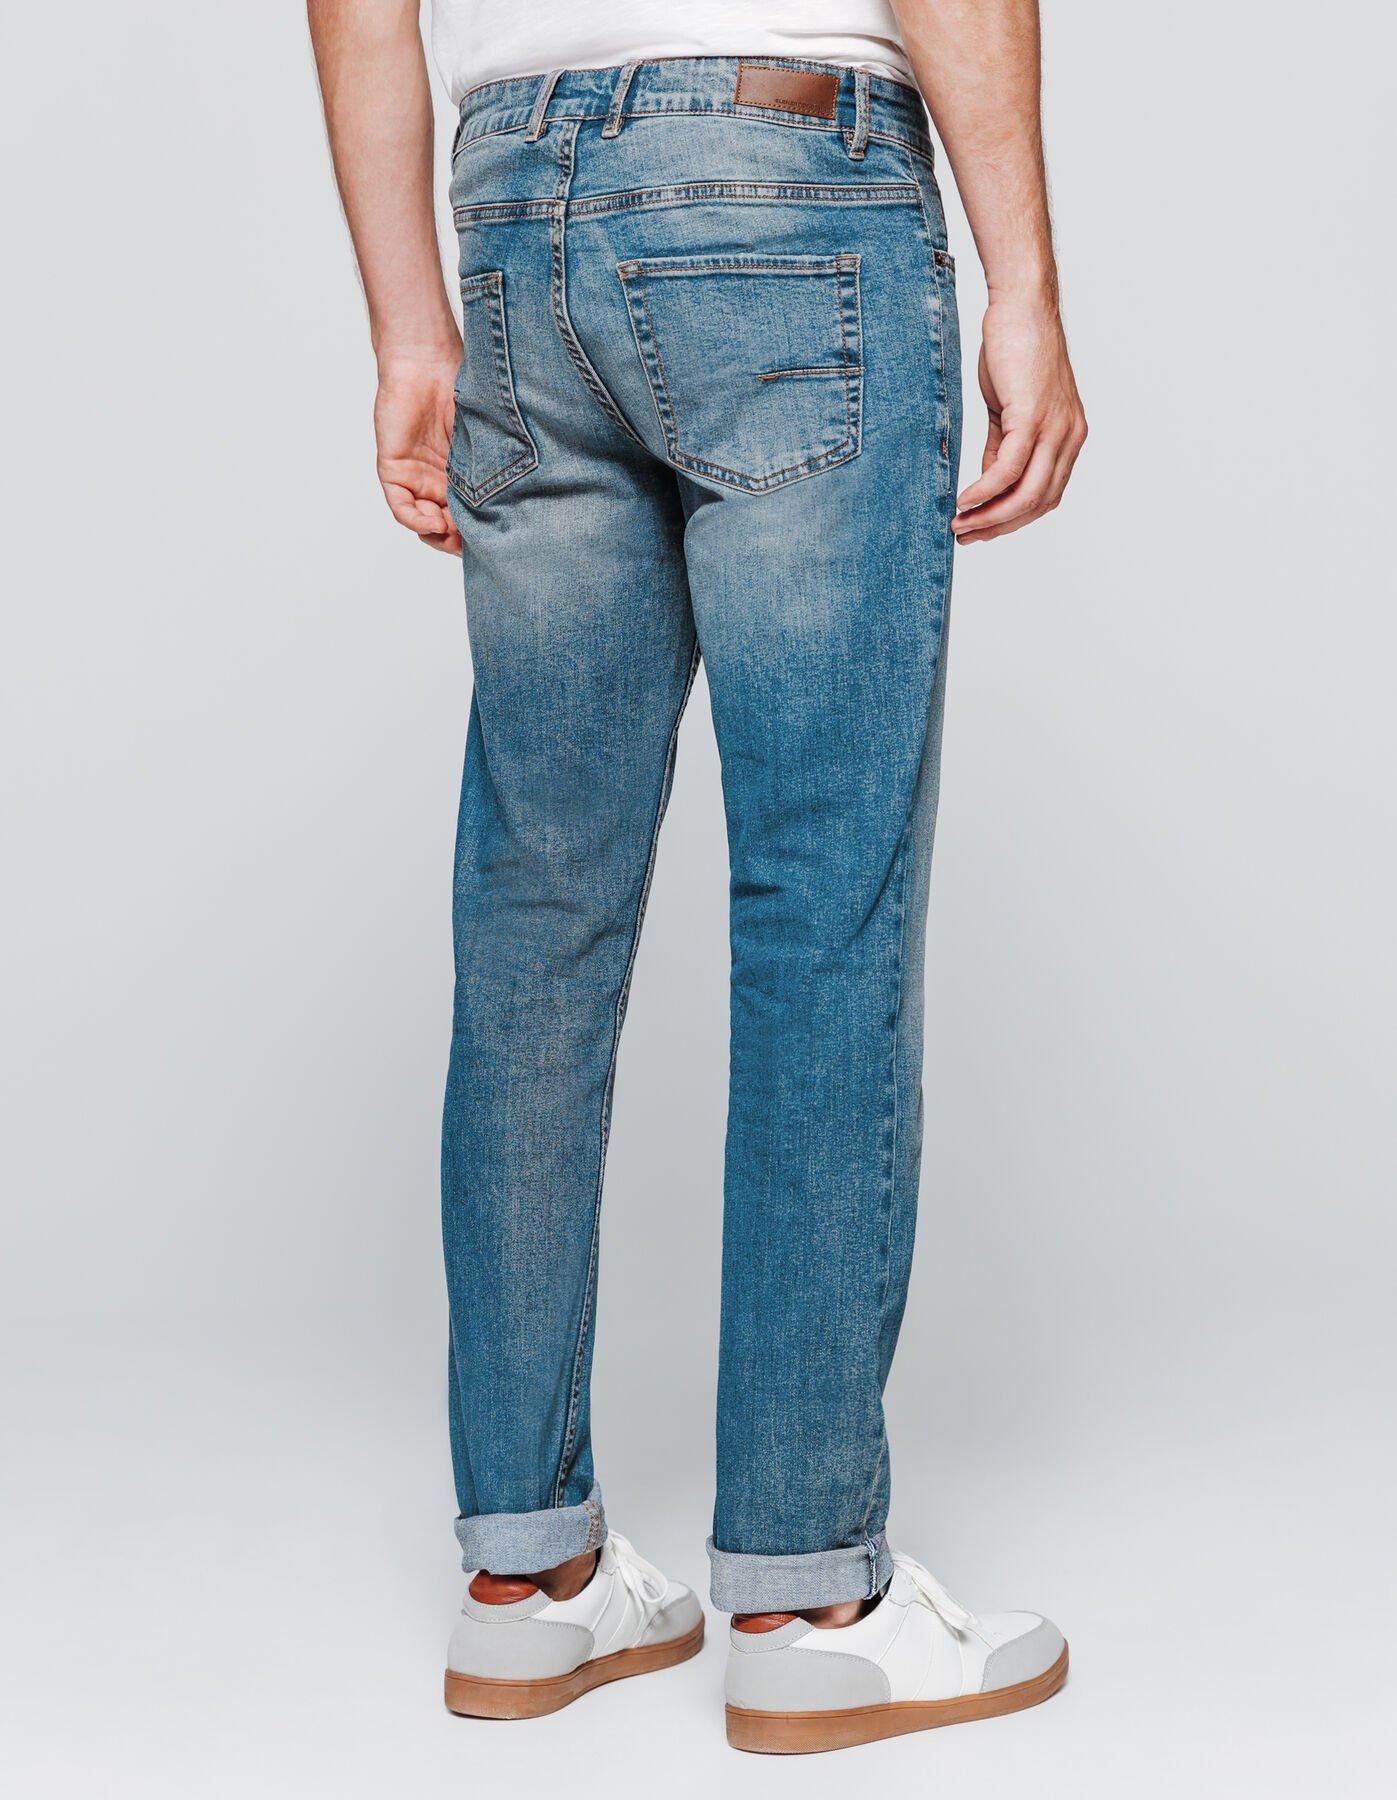 Jean slim #Tom double stone